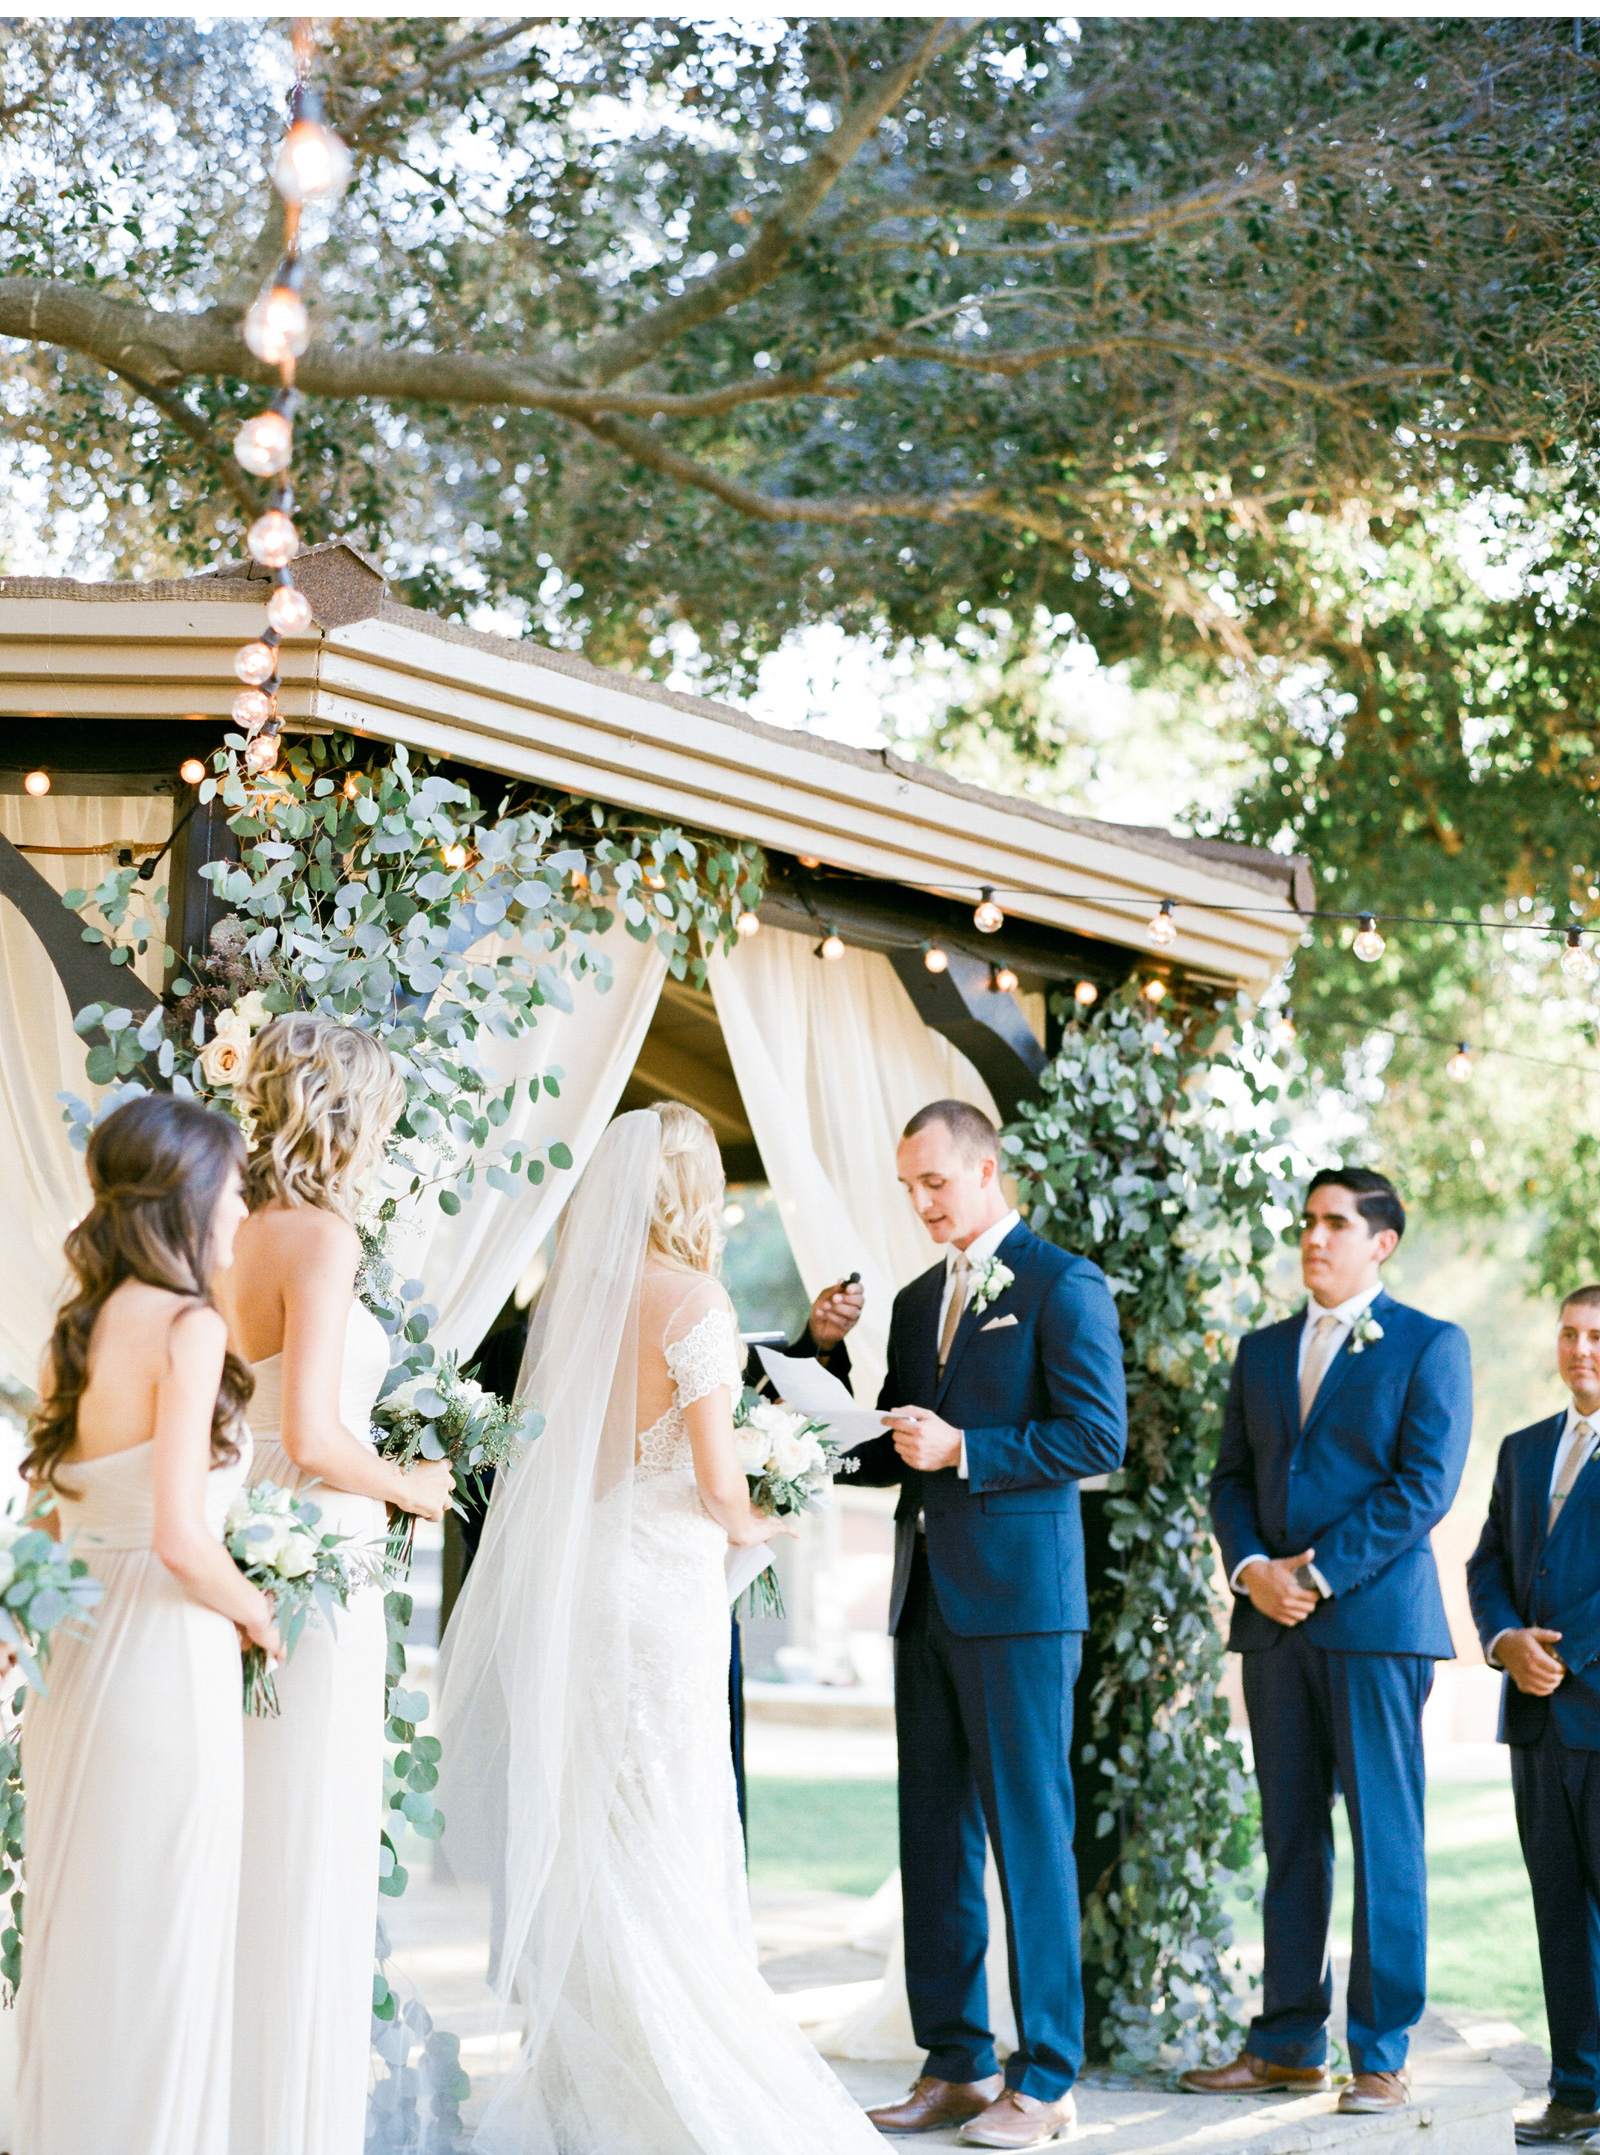 Triunfo-Orange-County-Temecula-Wedding-Photographer-Style-Me-Pretty-Natalie-Schutt-Photography_02.jpg